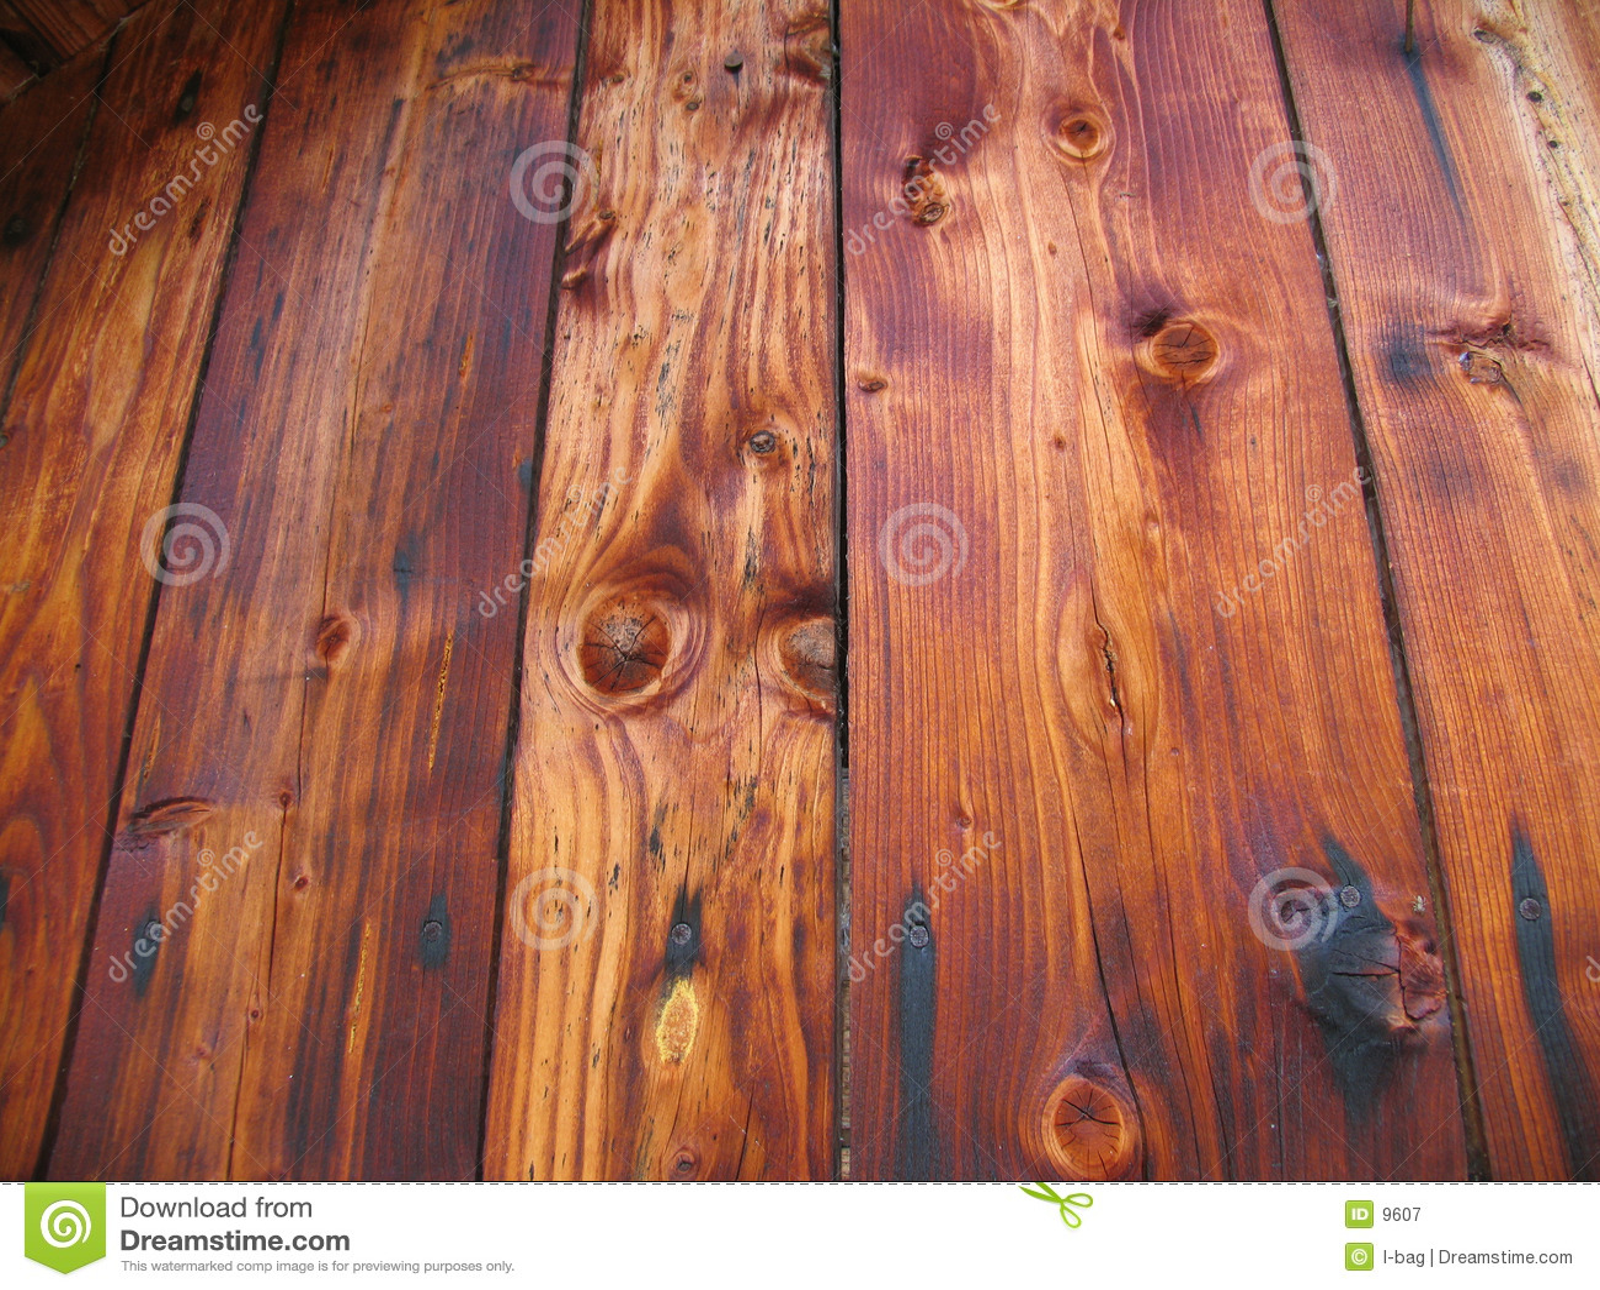 Viejos plancks de madera